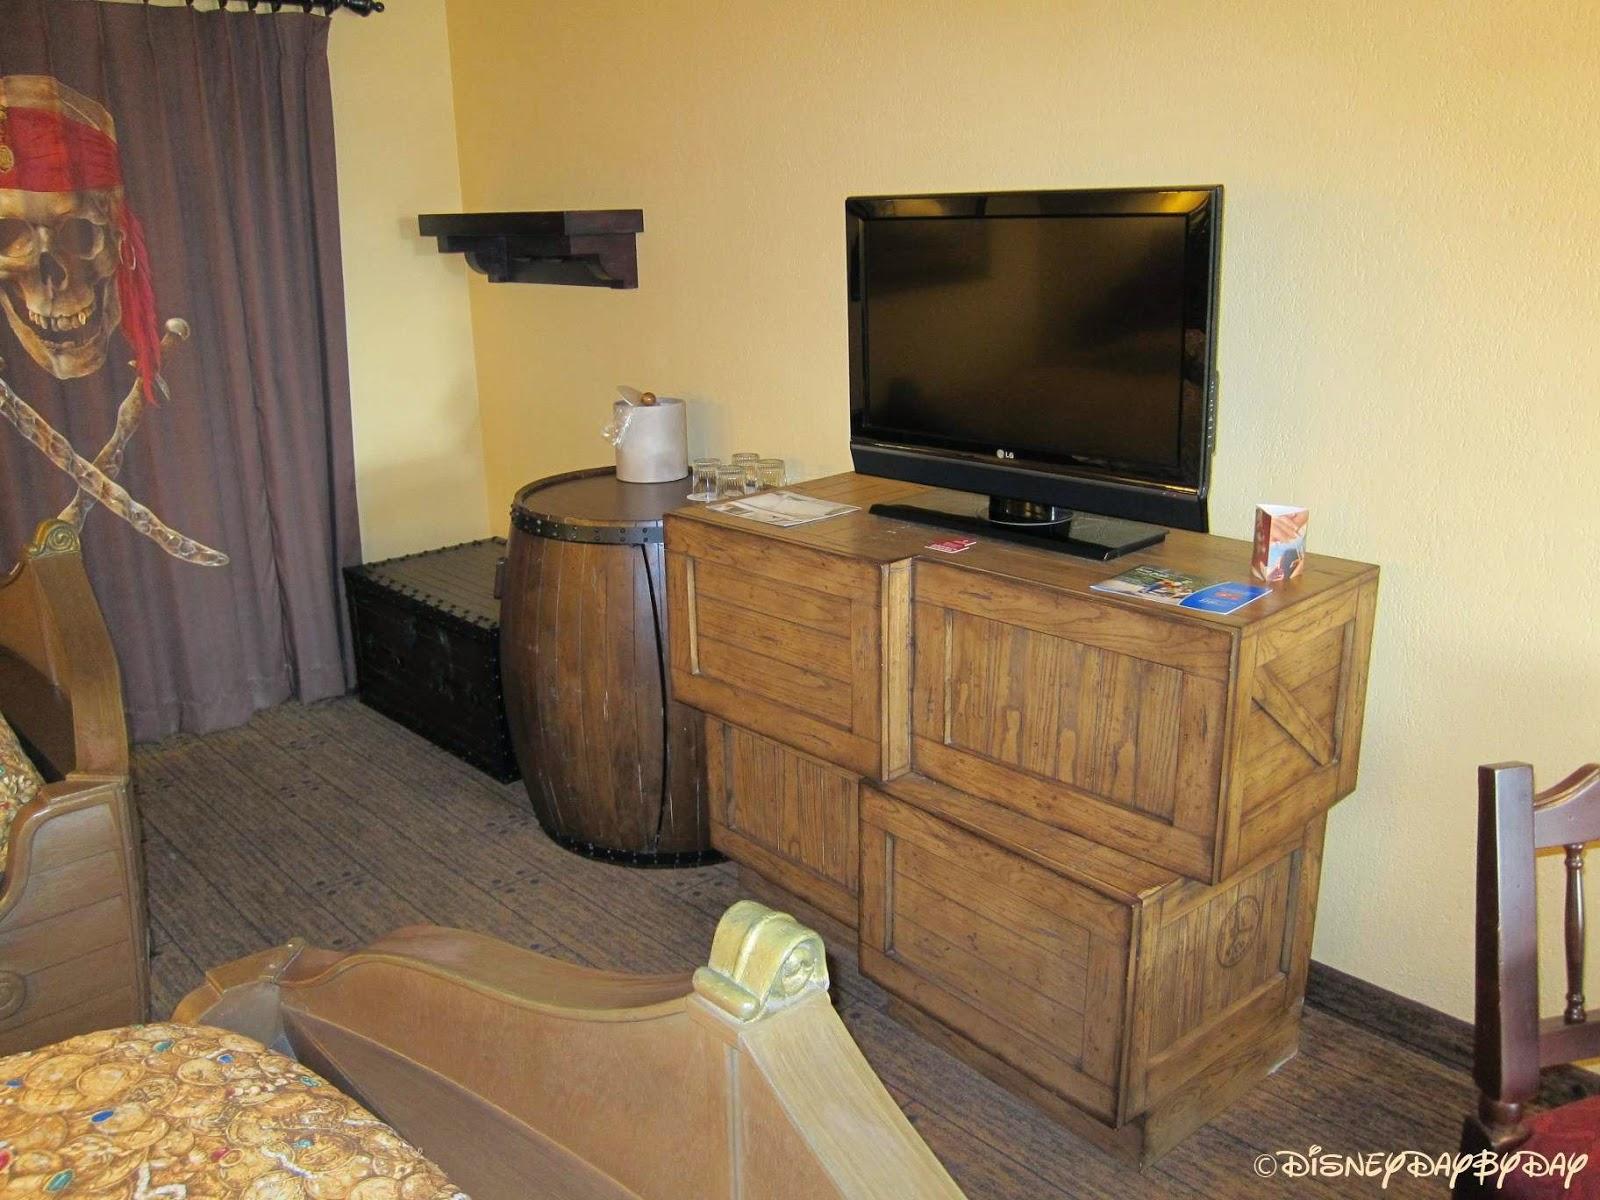 Bedroom Tv Stand Designs : Bedroom tv stand ideas design